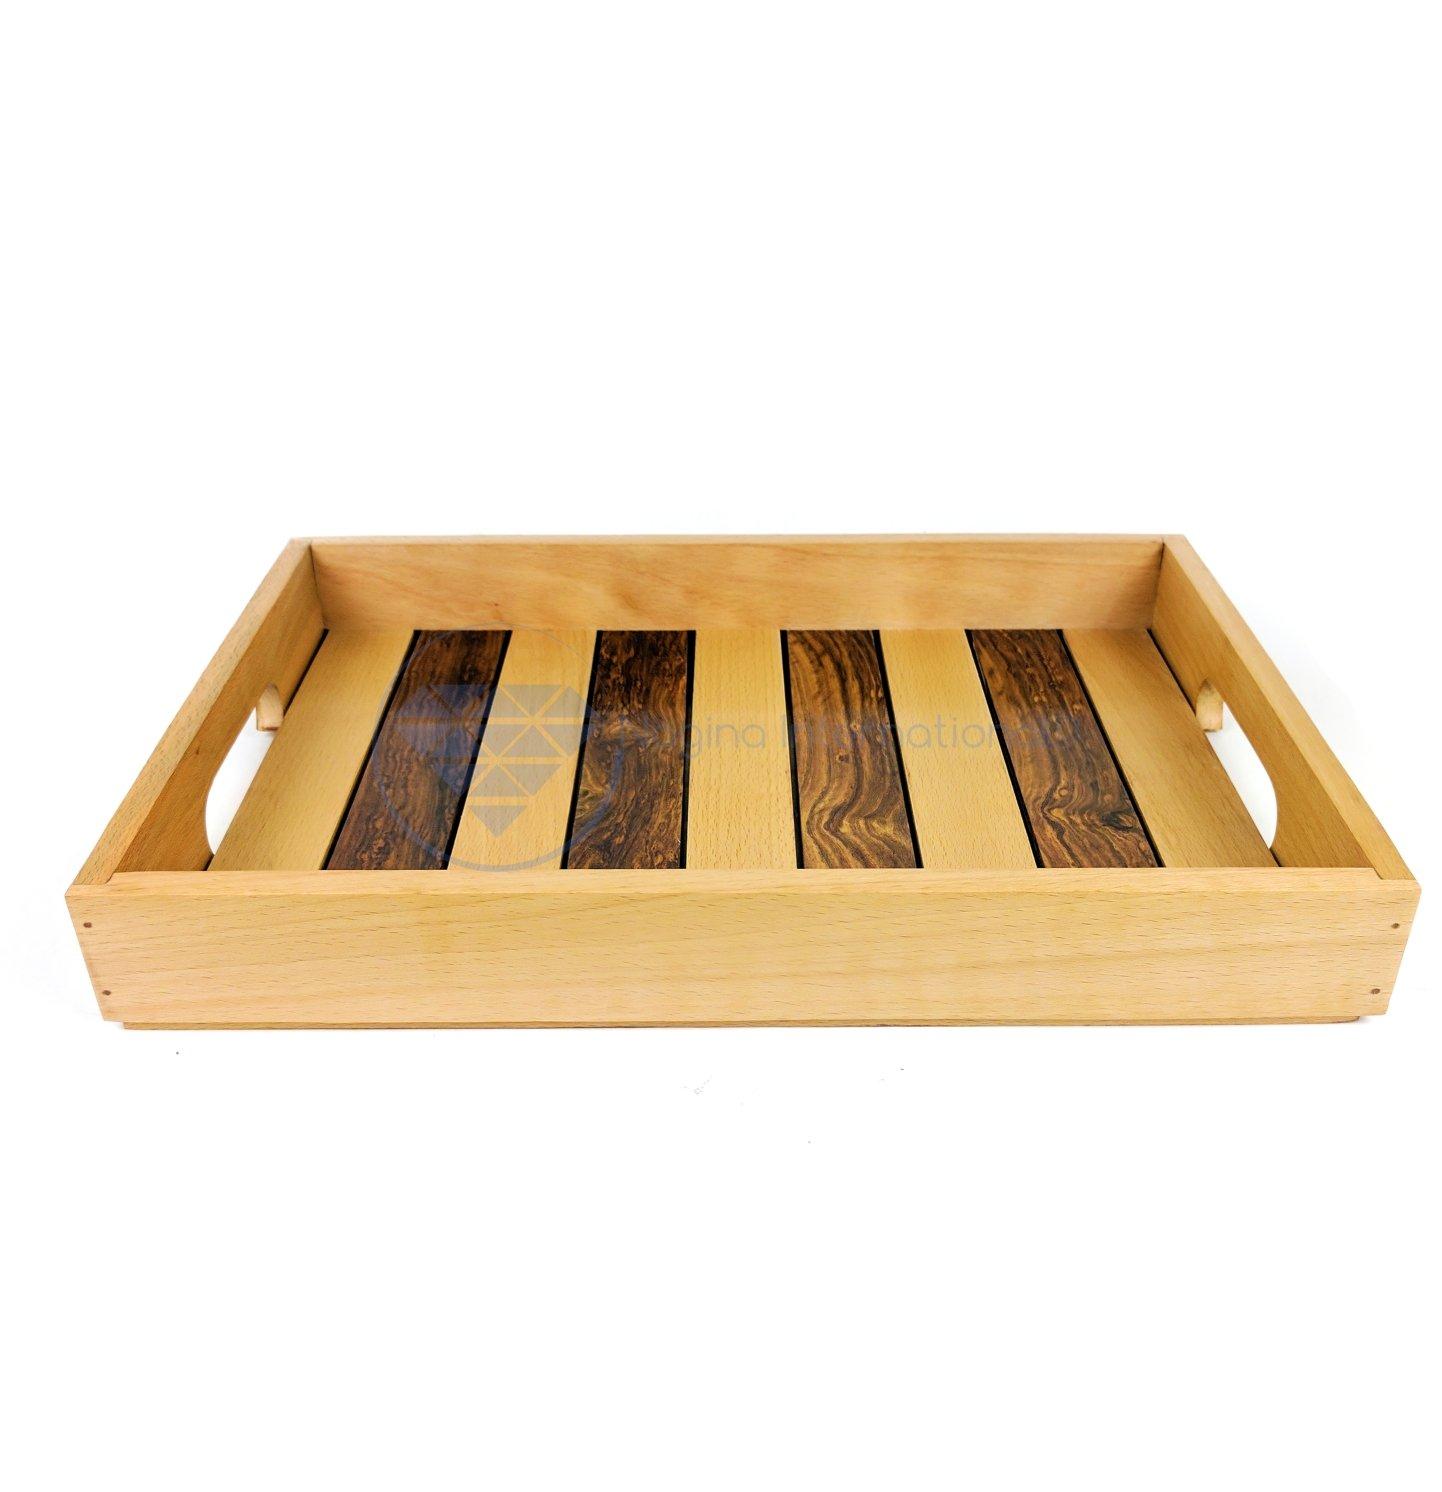 Nagina International Hand Made Premium Wooden Coffee Tray | Kitchen Trays & Table Decor